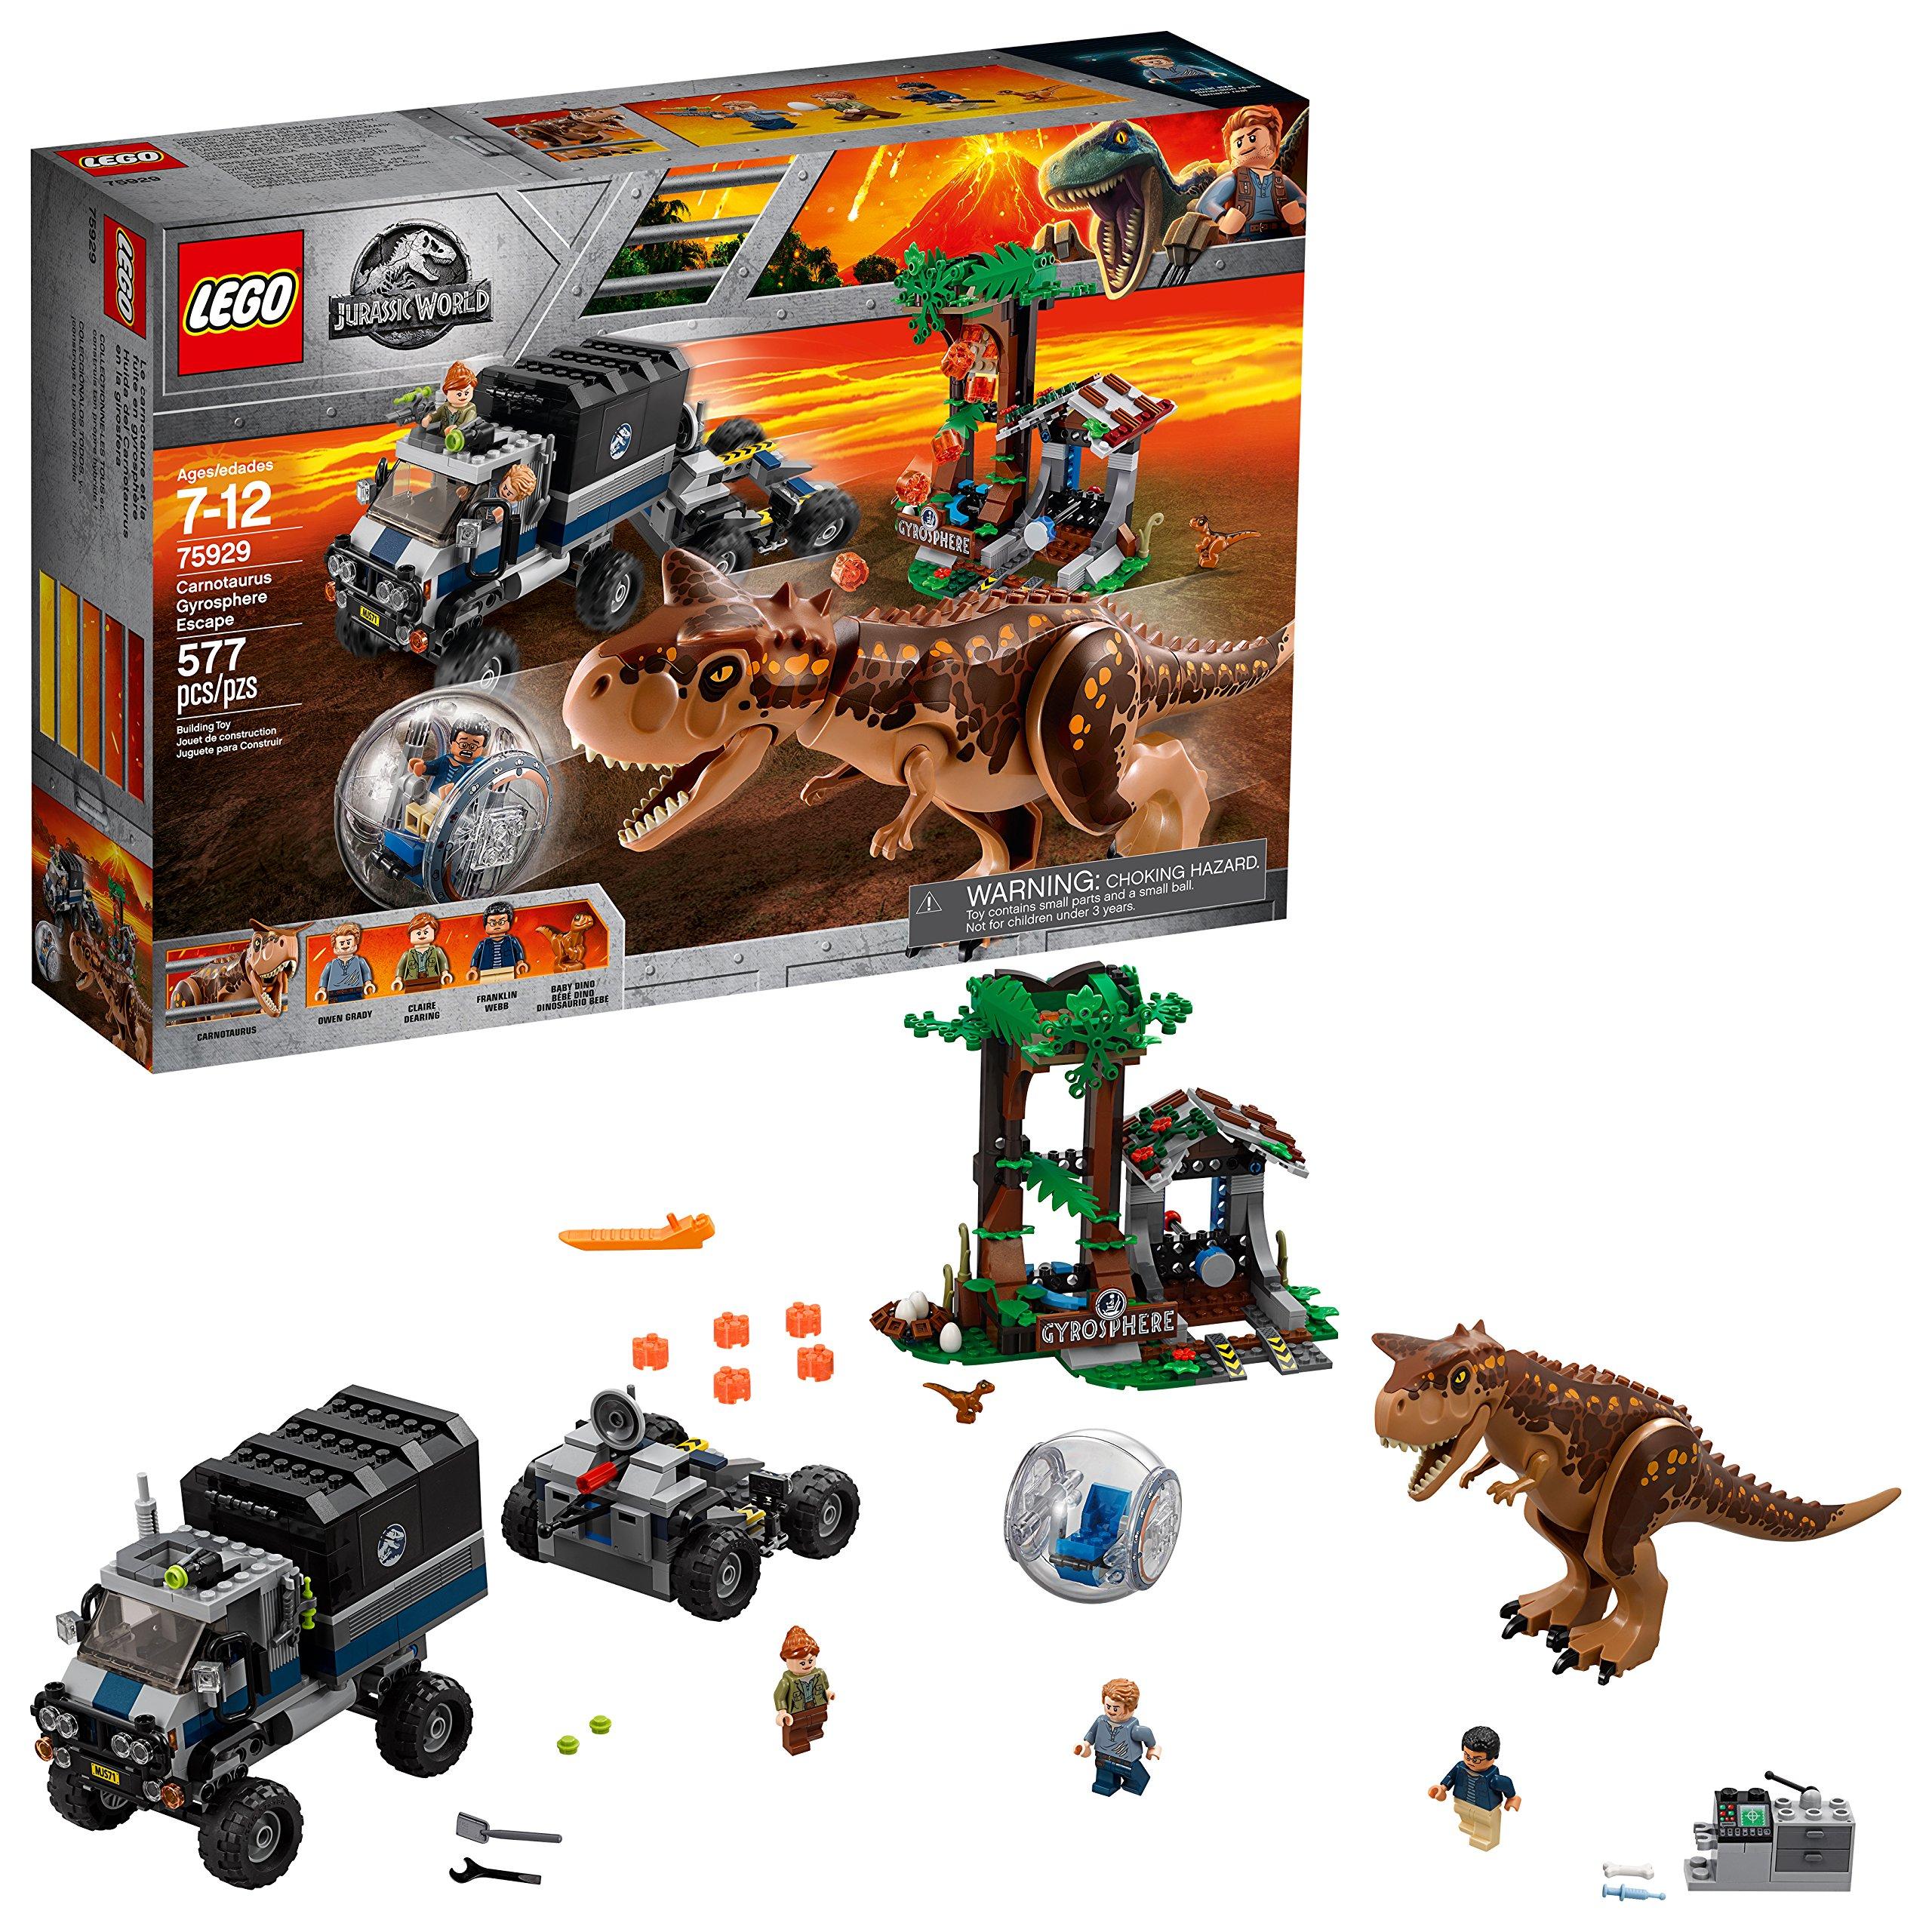 Escape Piece Jurassic 75929 Carnotaurus Gyrosphere Building Lego World Kit577 redBoWCx